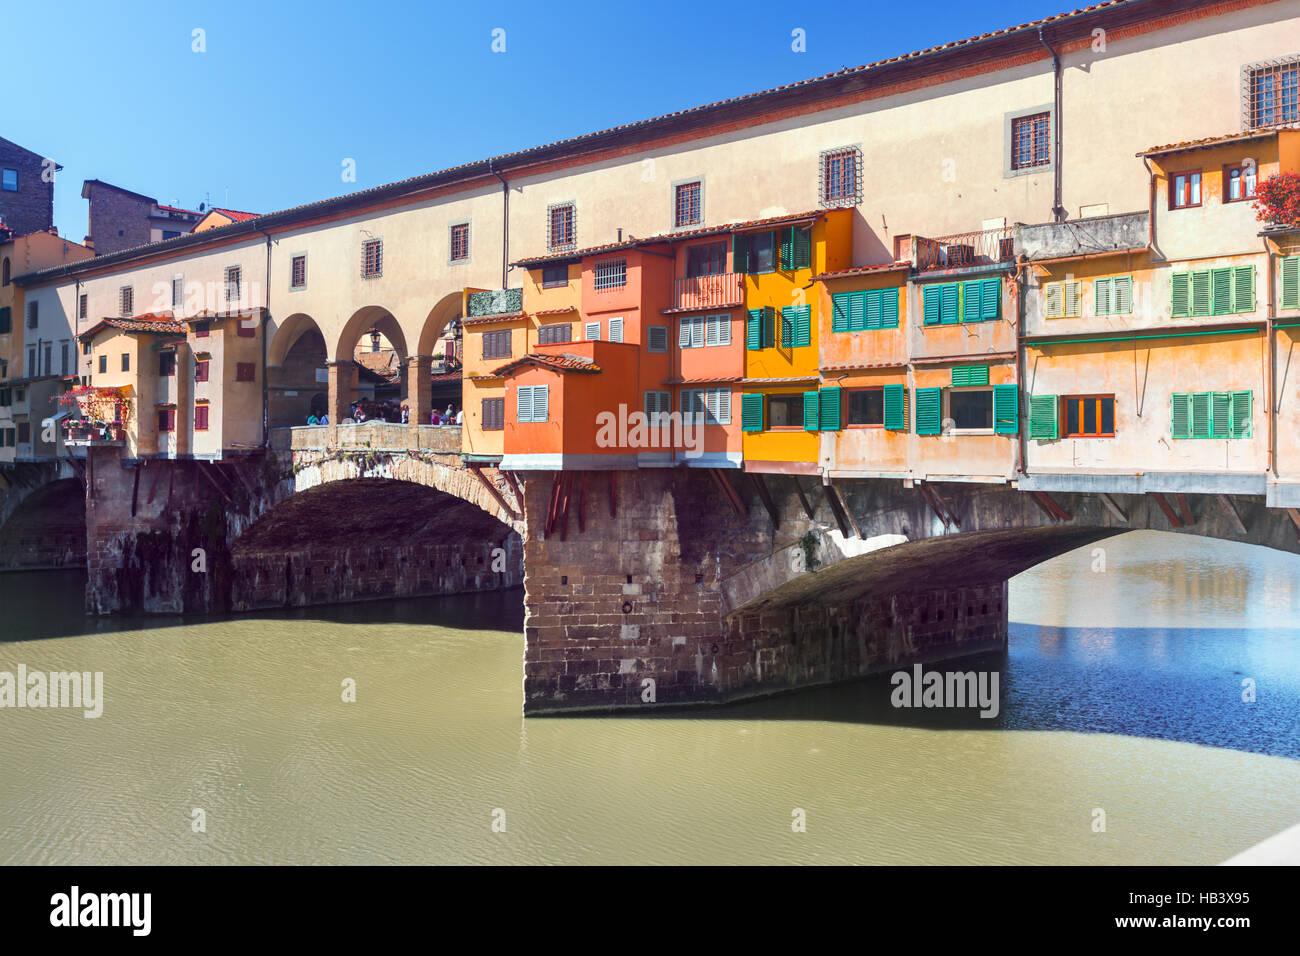 Ponte Vecchio over Arno river in Florence - Stock Image